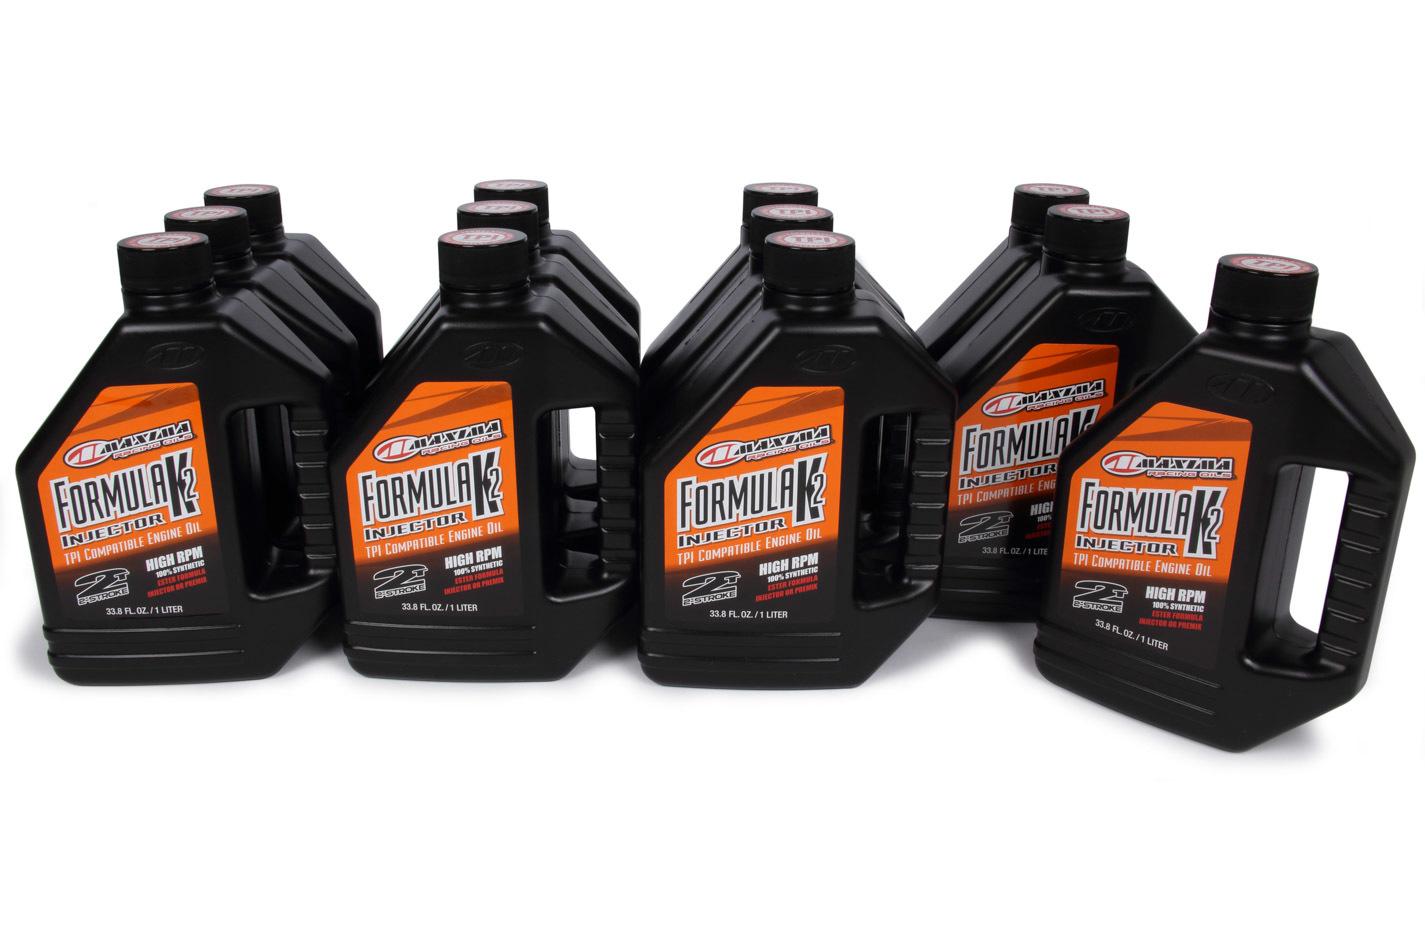 Maxima Racing Oils Formula K2 Injector 2-St roke Oil Case 12x1 Liter